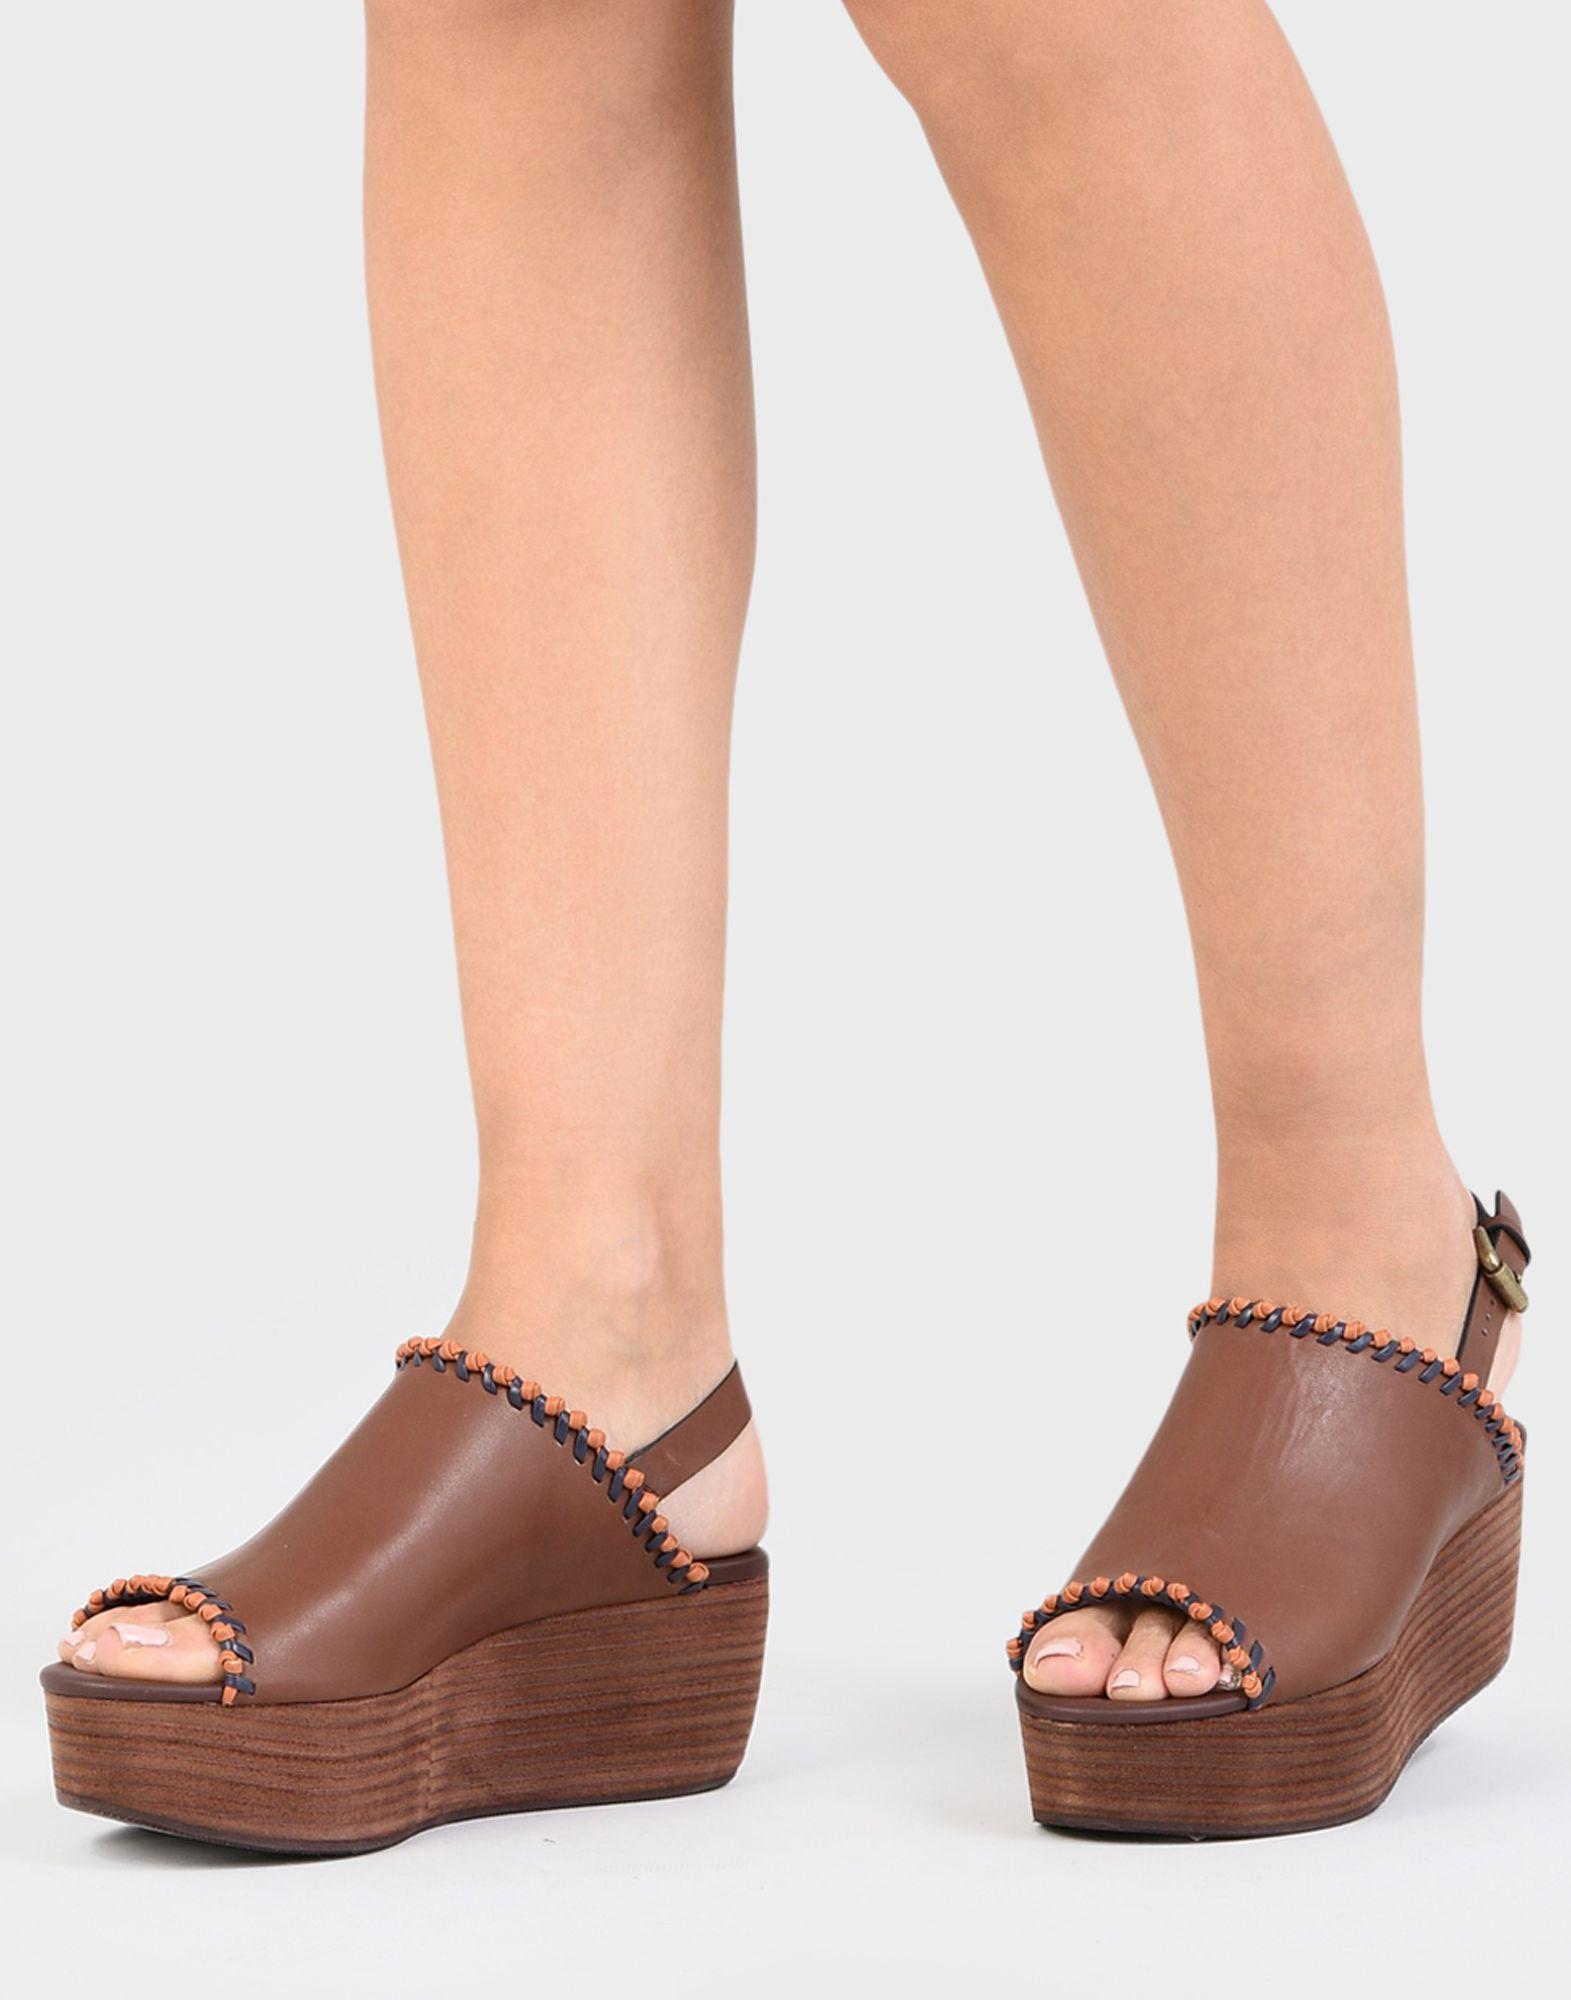 Stilvolle billige Schuhe See  By Chloé Sandalen Damen  See 11380377HI e70e3a